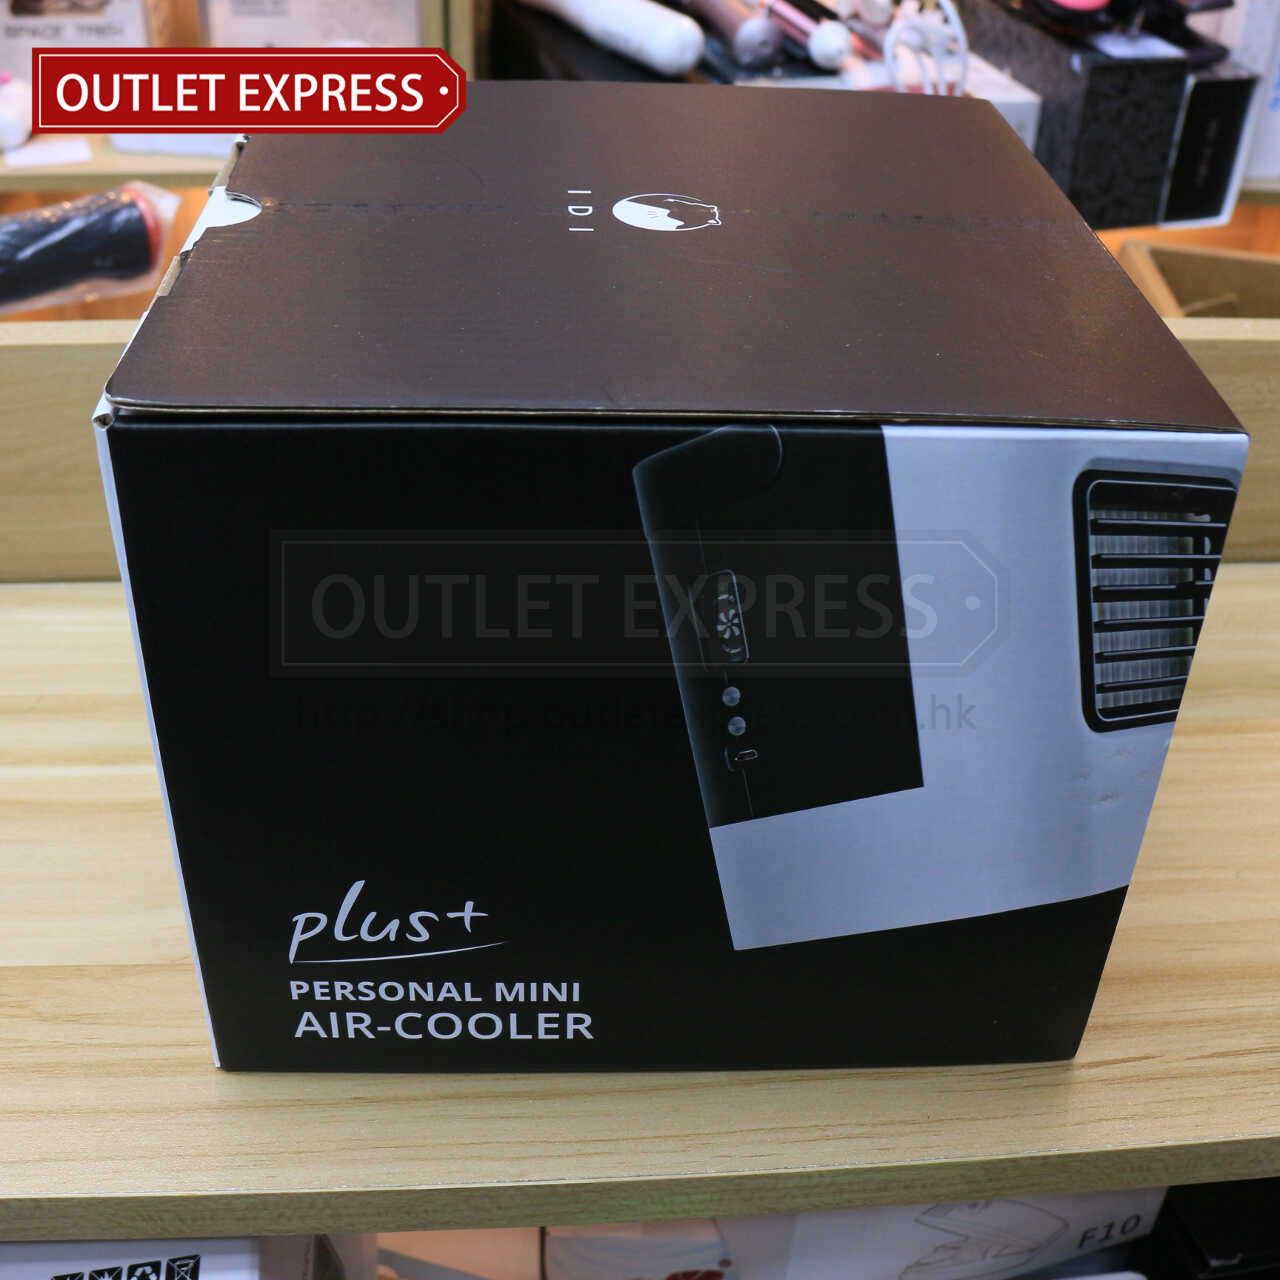 IDI USB 納米攜帶冷風機 包裝盒- Outlet Express HK生活百貨城實拍相片